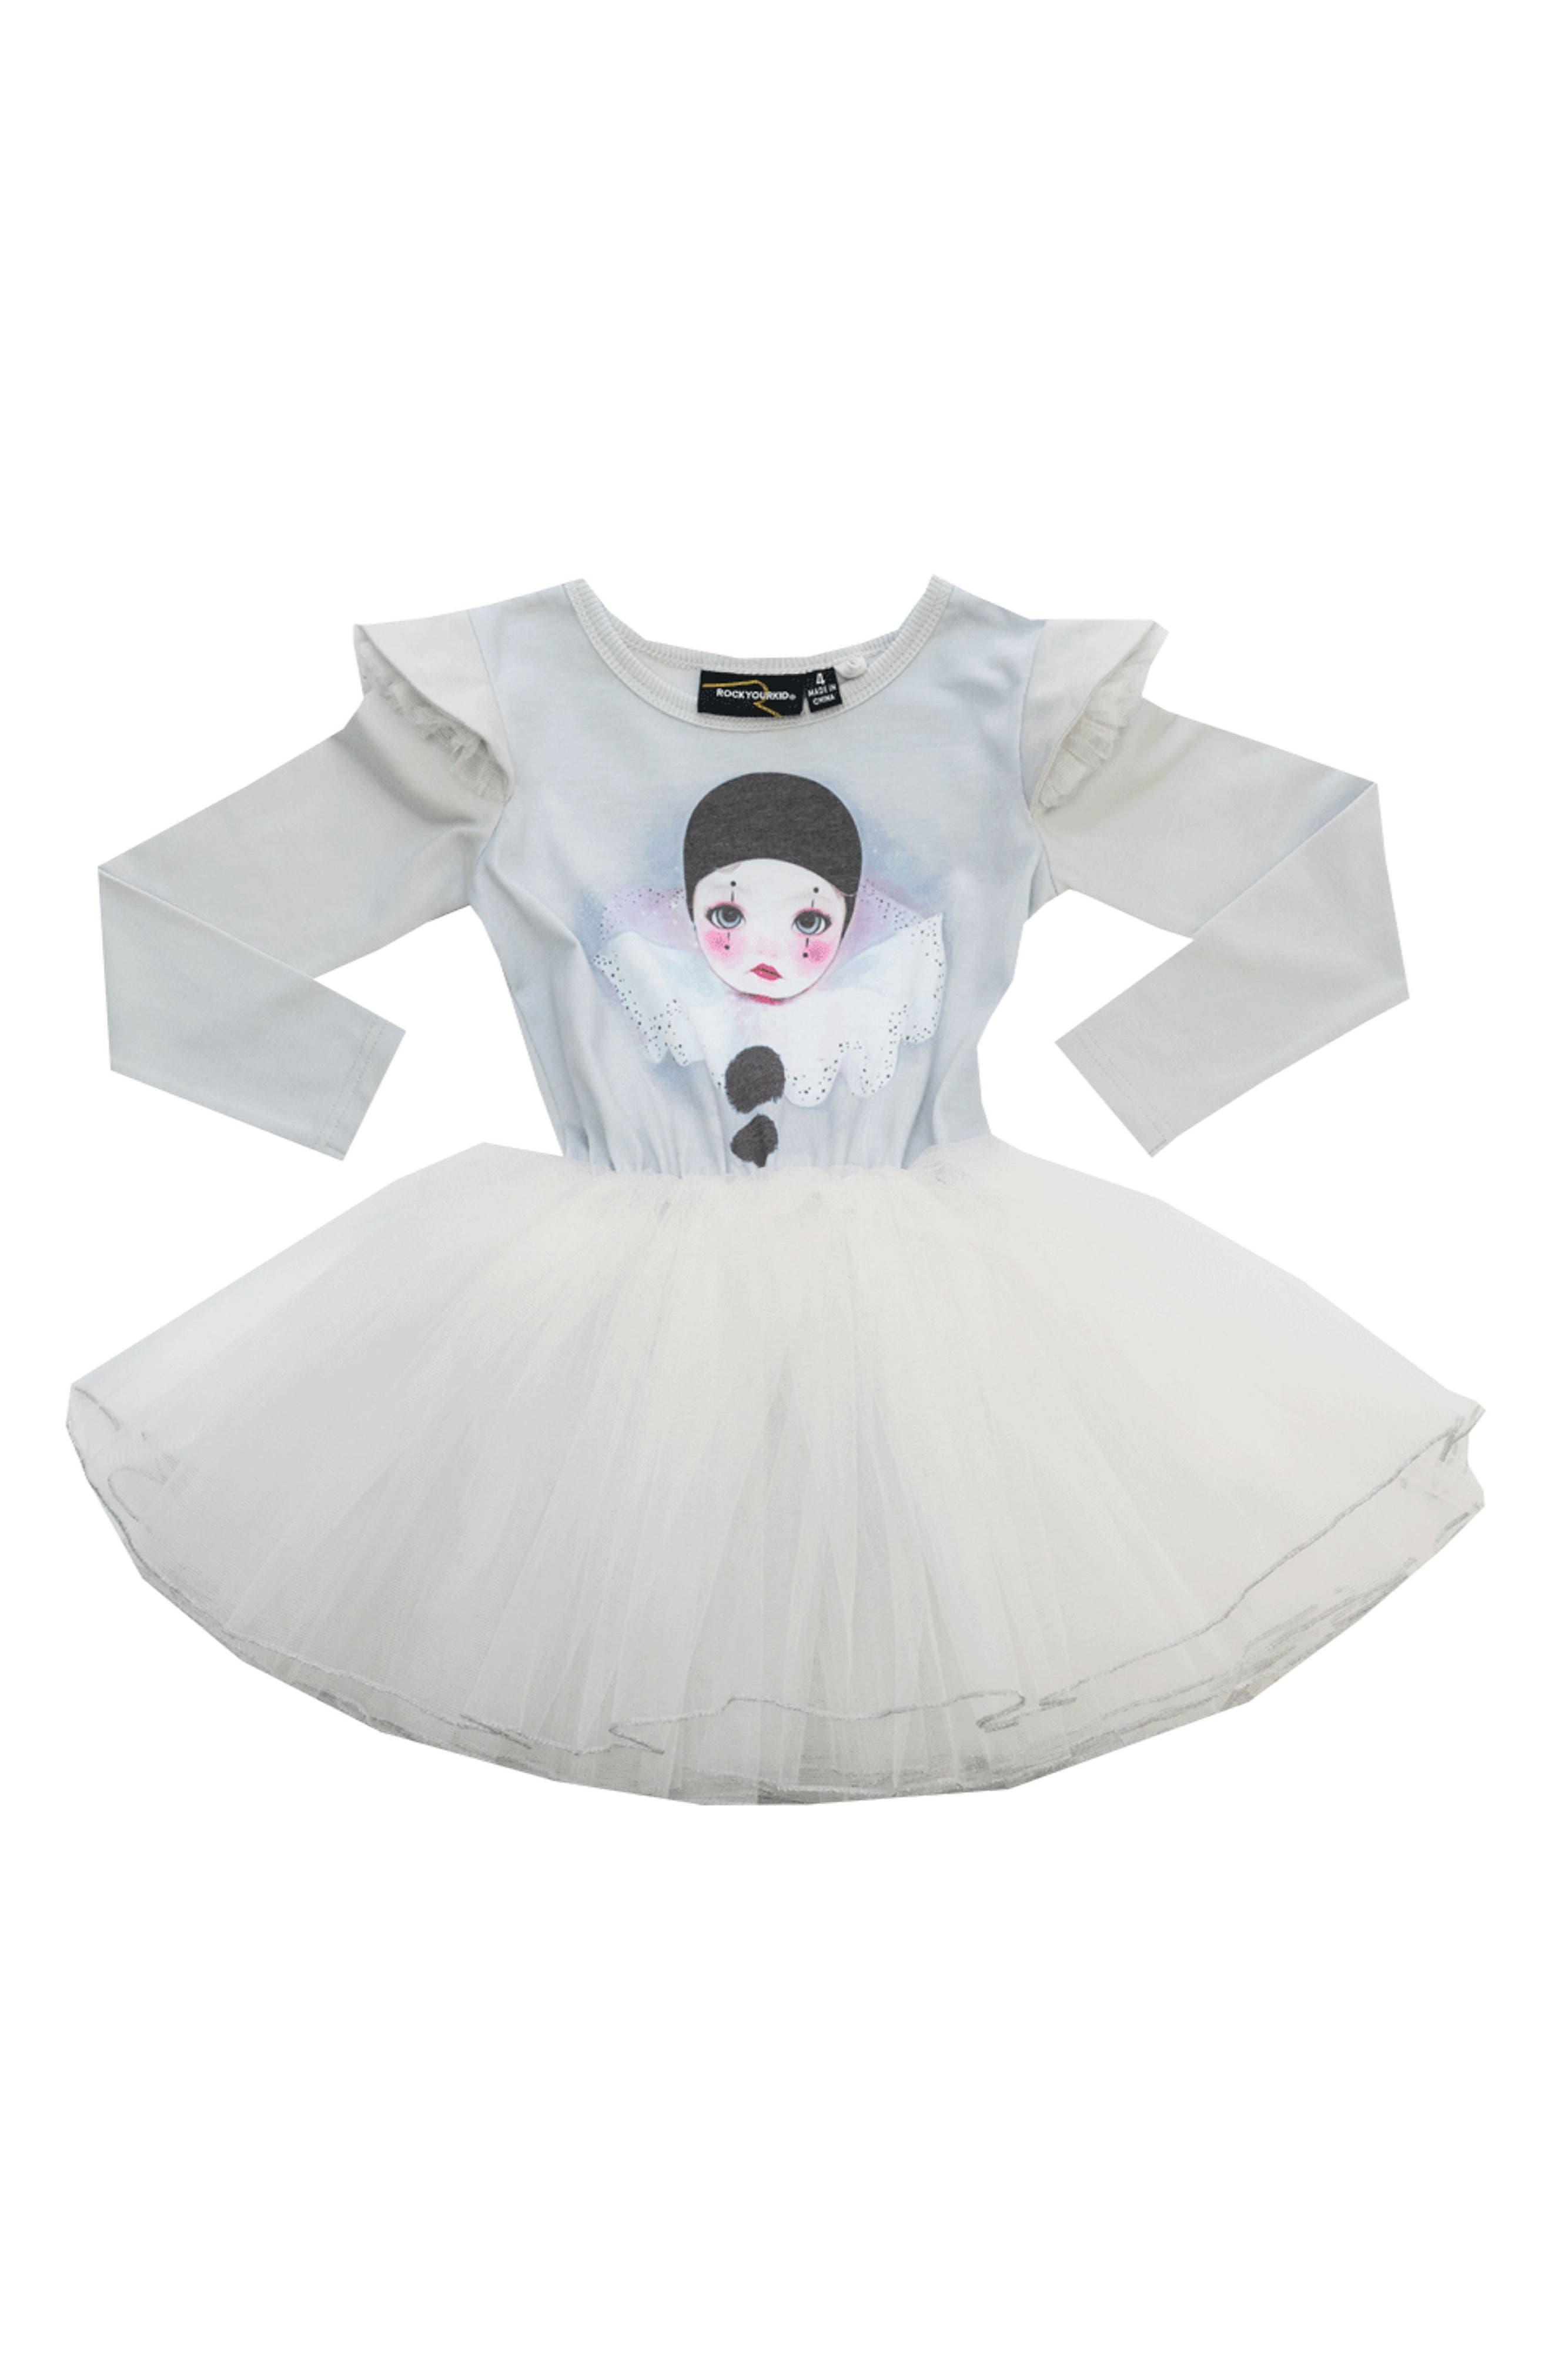 Pierrot Circus Dress,                             Alternate thumbnail 4, color,                             040